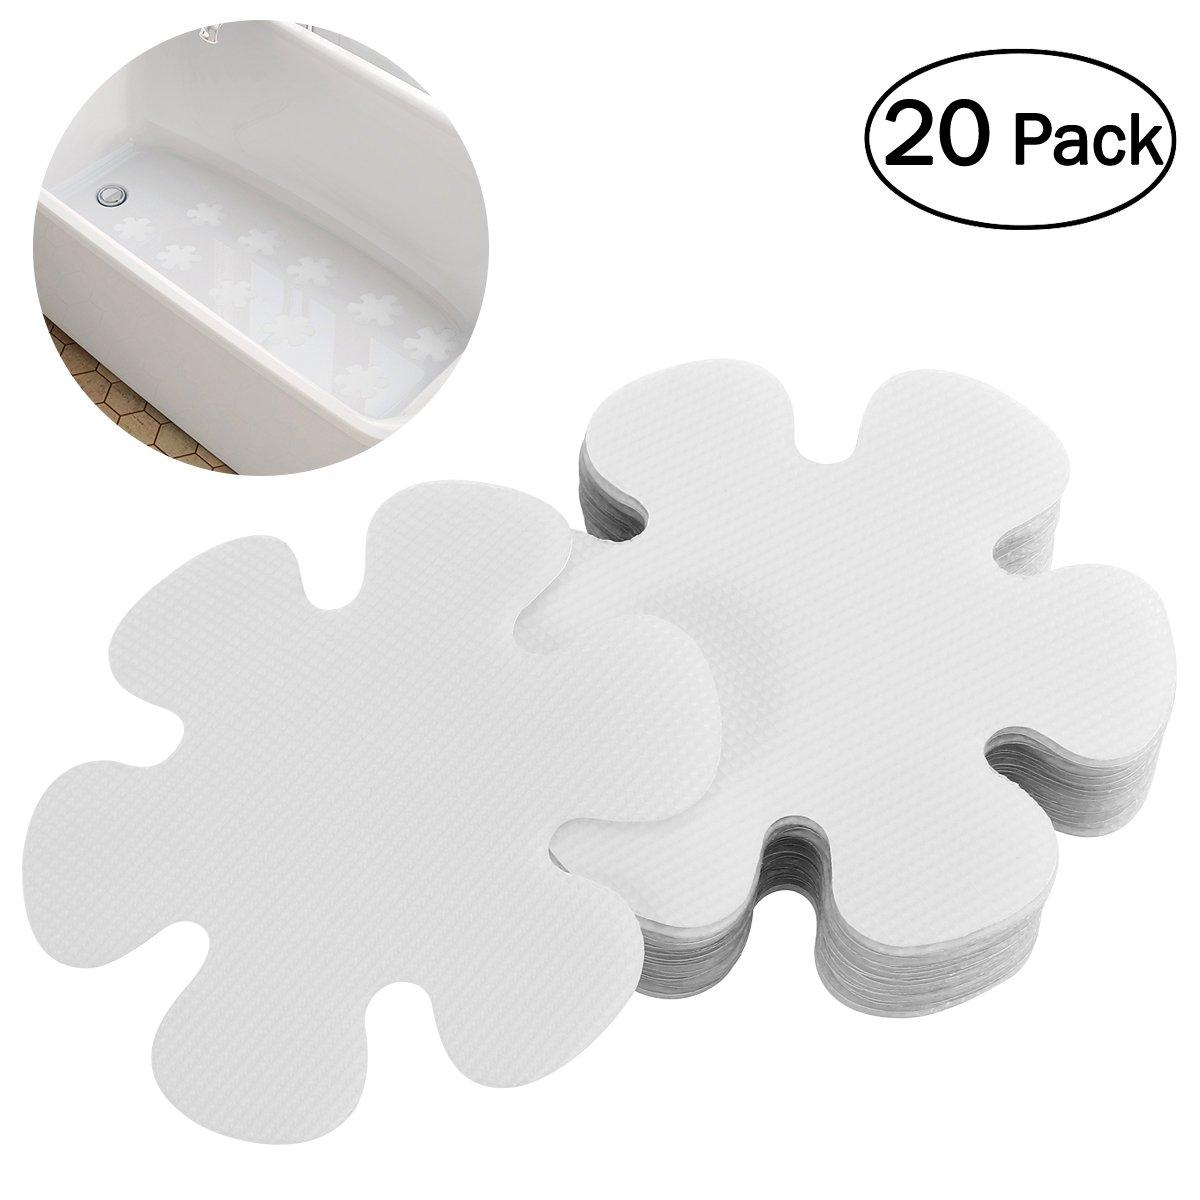 OUNONA 20 PCS Non-Slip Safety Shower Treads 10CM PEVA Anti-slip Discs Tape Non Slip Stickers for Tubs Bath (Clear)